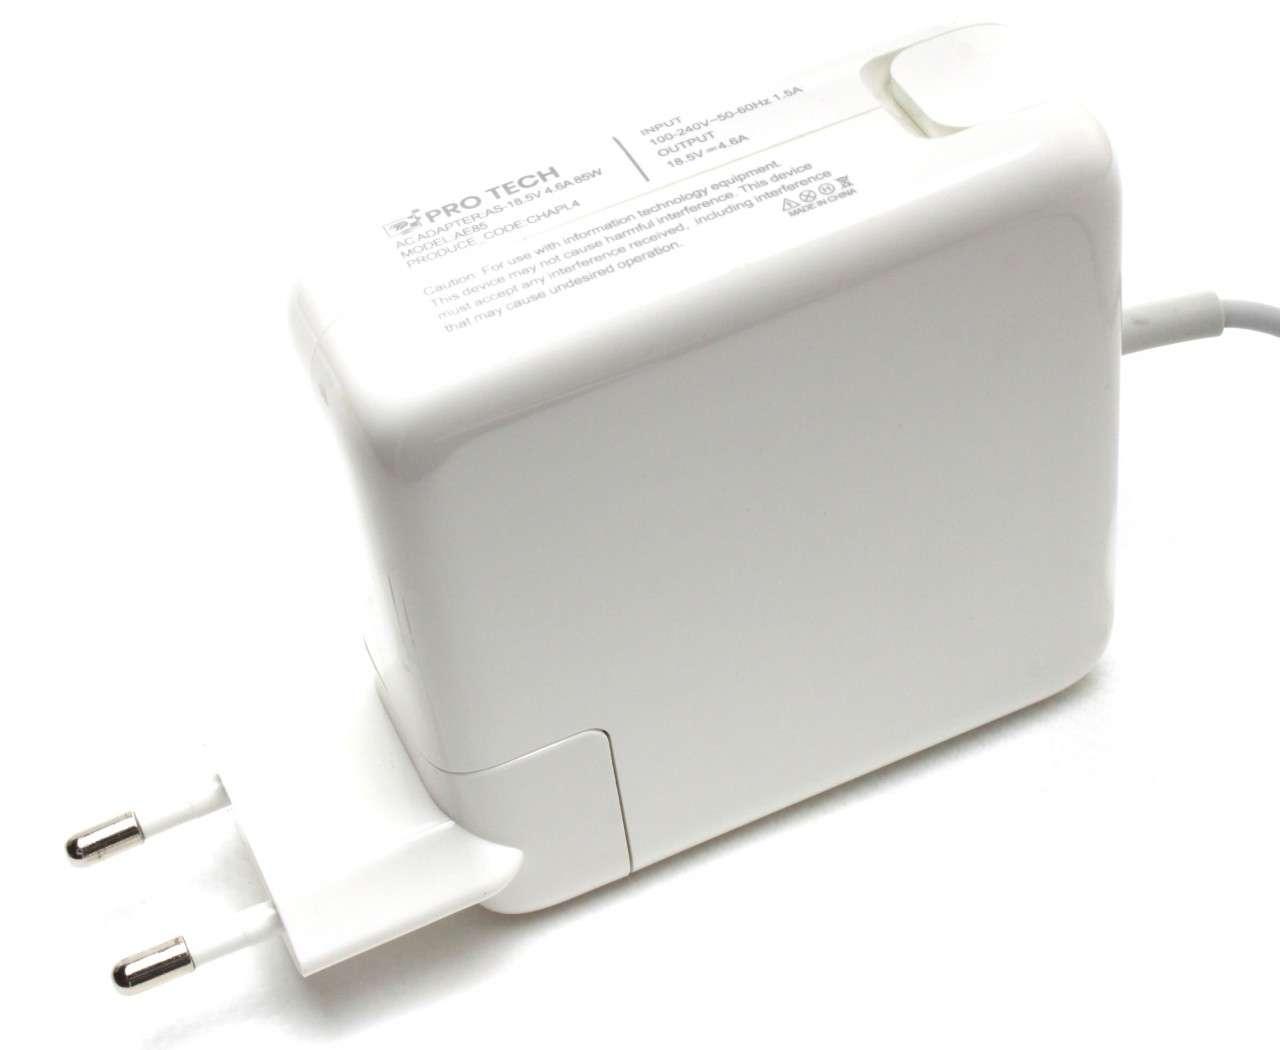 Incarcator Apple MacBook Pro 85W Replacement imagine powerlaptop.ro 2021